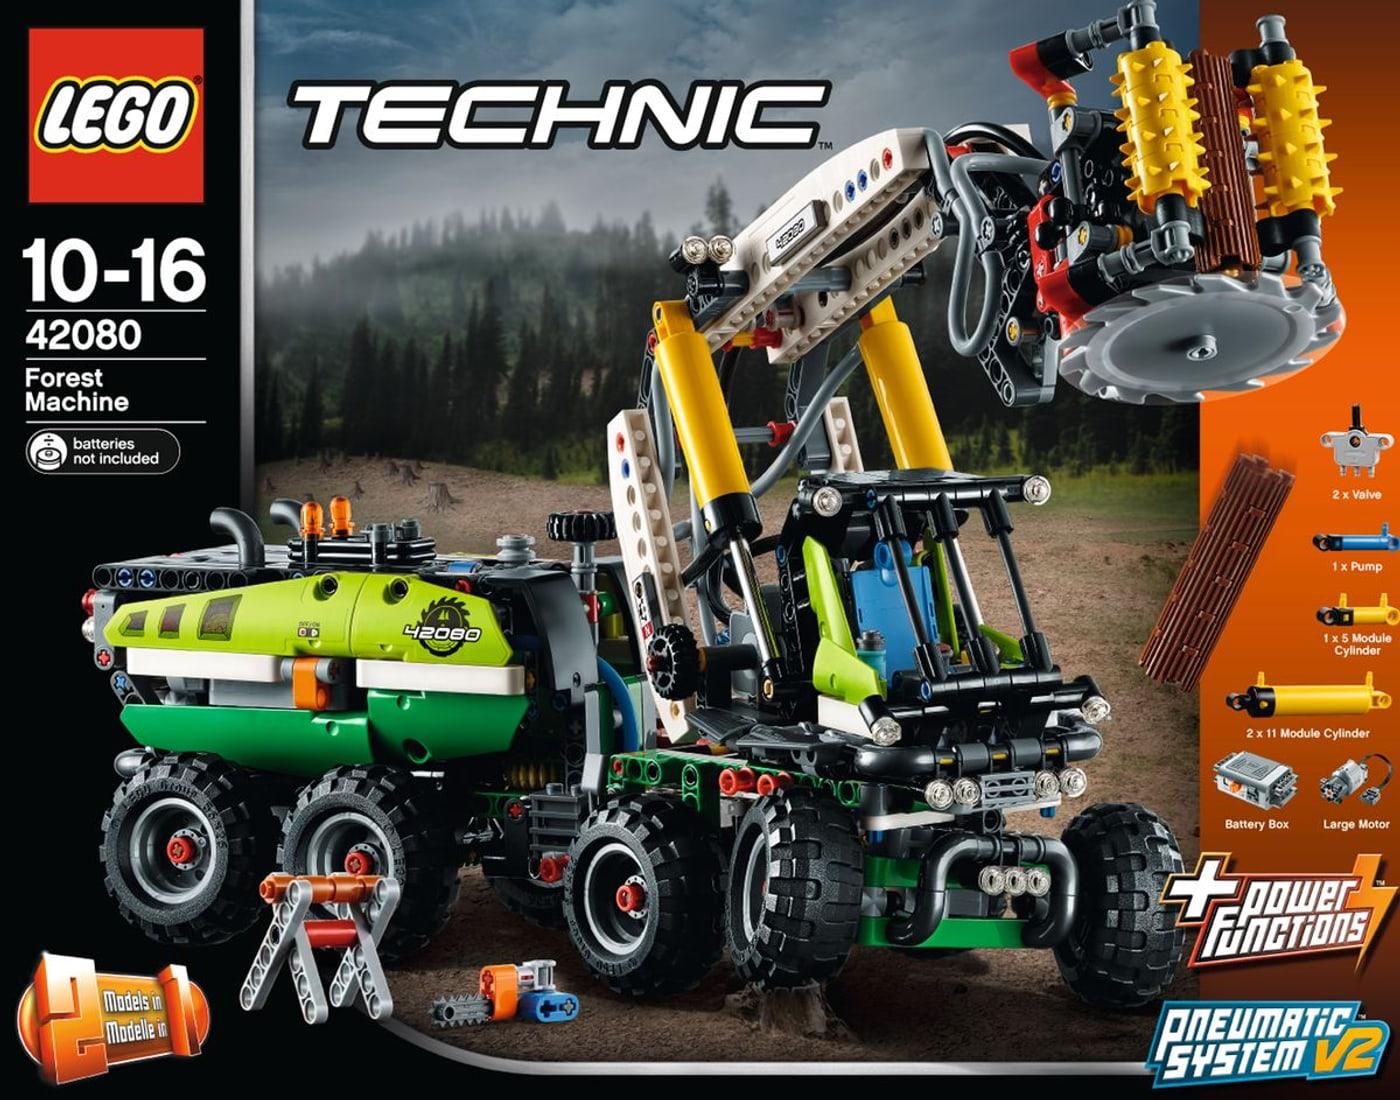 Lego Technic Macchina forestale 42080